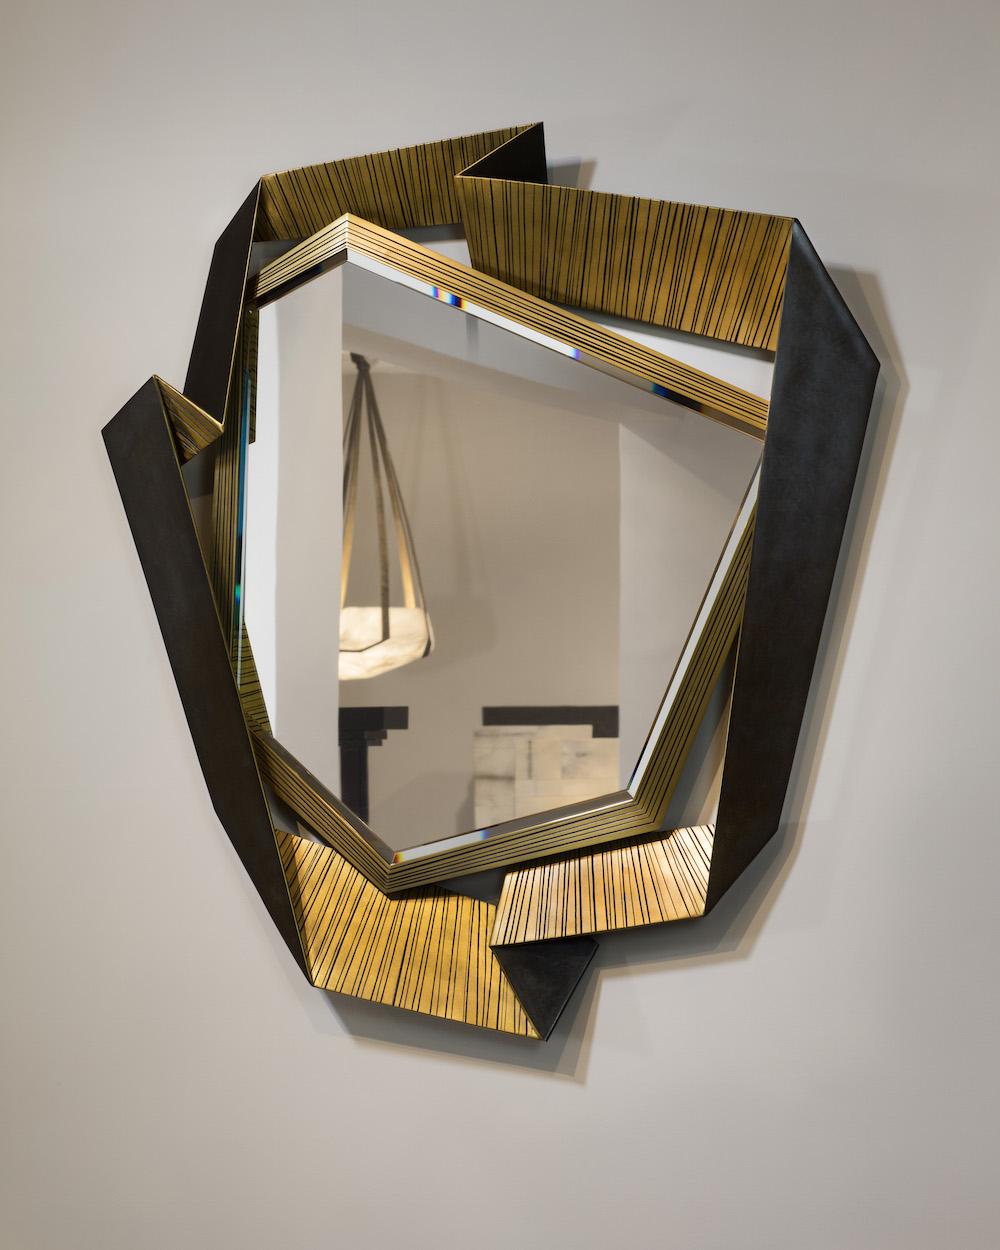 Galerie Hervé Van der Straeten Miroir Rebelle, Courtesy of Hervé Van der Straeten